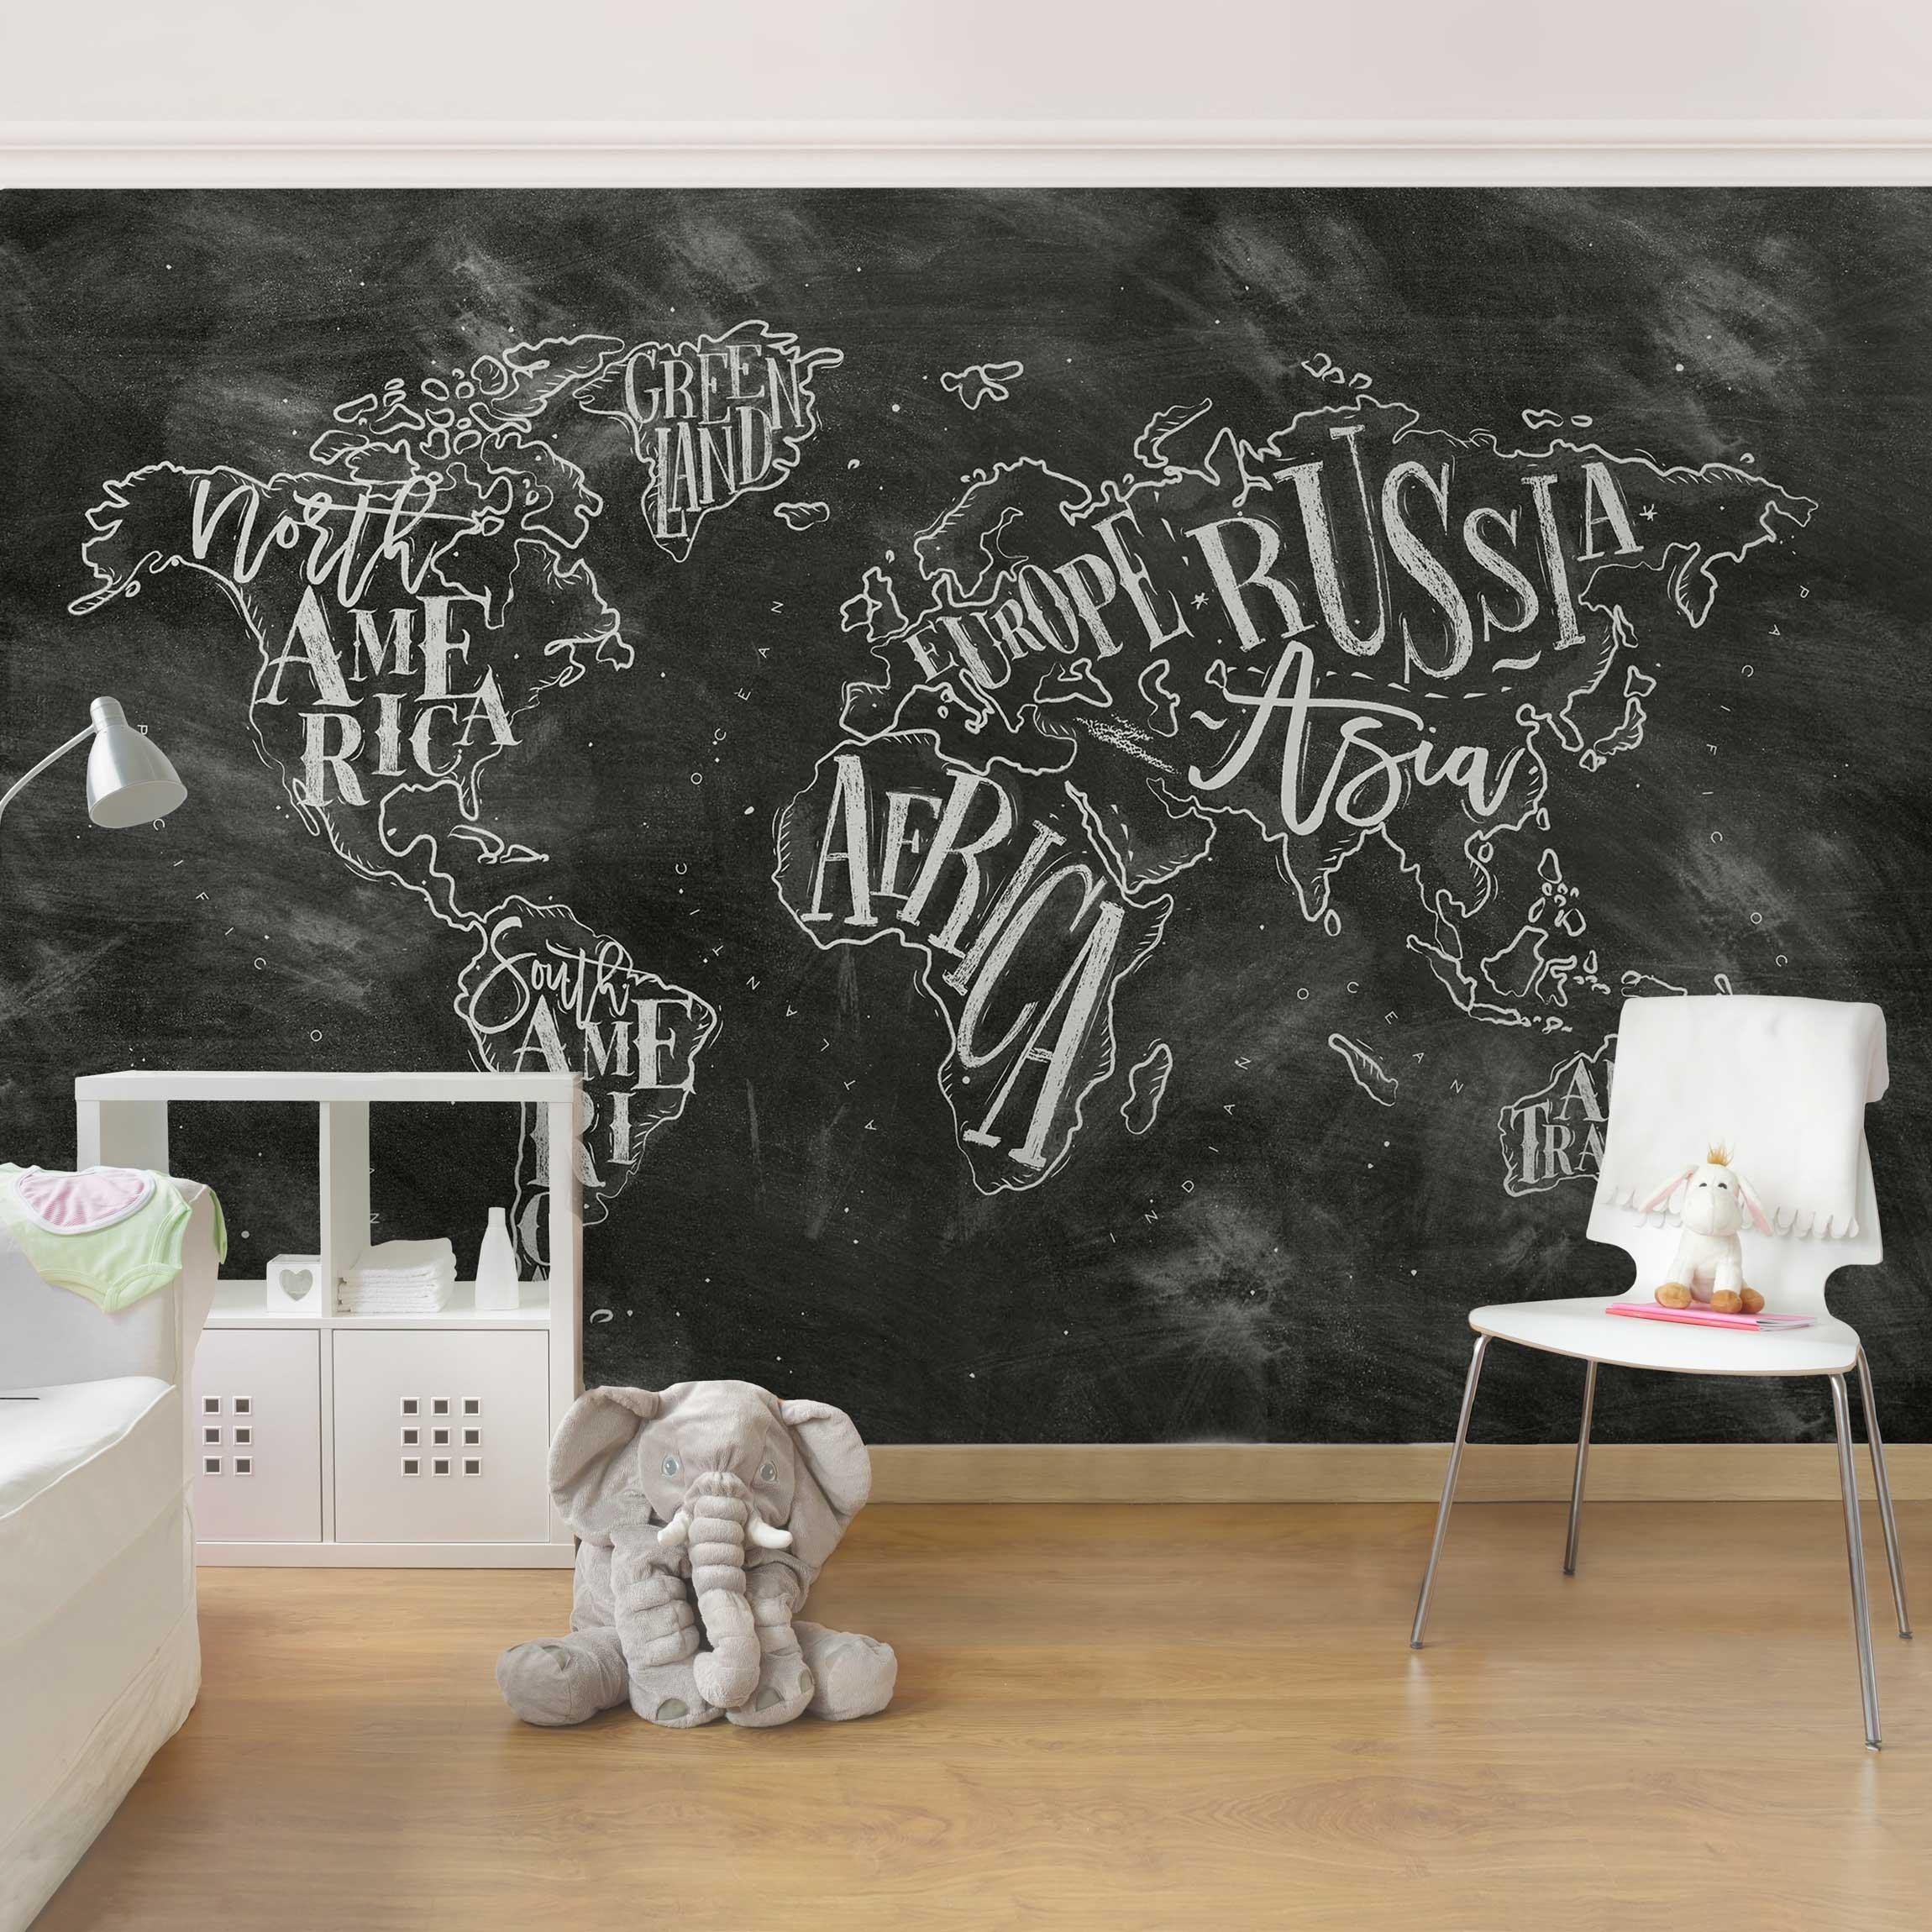 Tapete selbstklebend Kreide Weltkarte  Wandbild Qu - Kreide Tapete